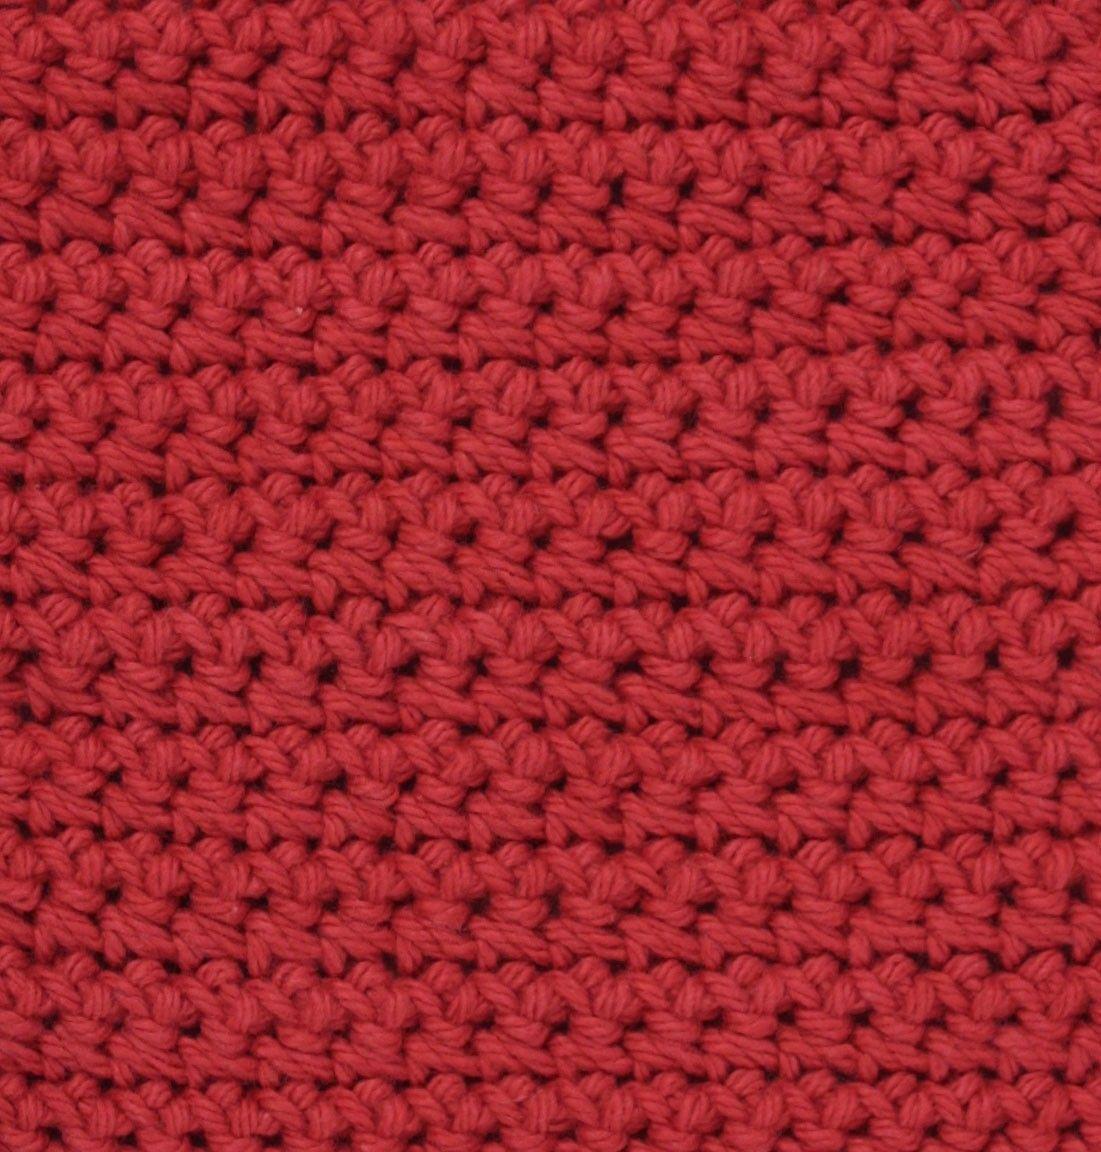 Yarnspirations.com - Bernat Handicrafter Cotton 340   400 gr - Yarn ... d6bae7768